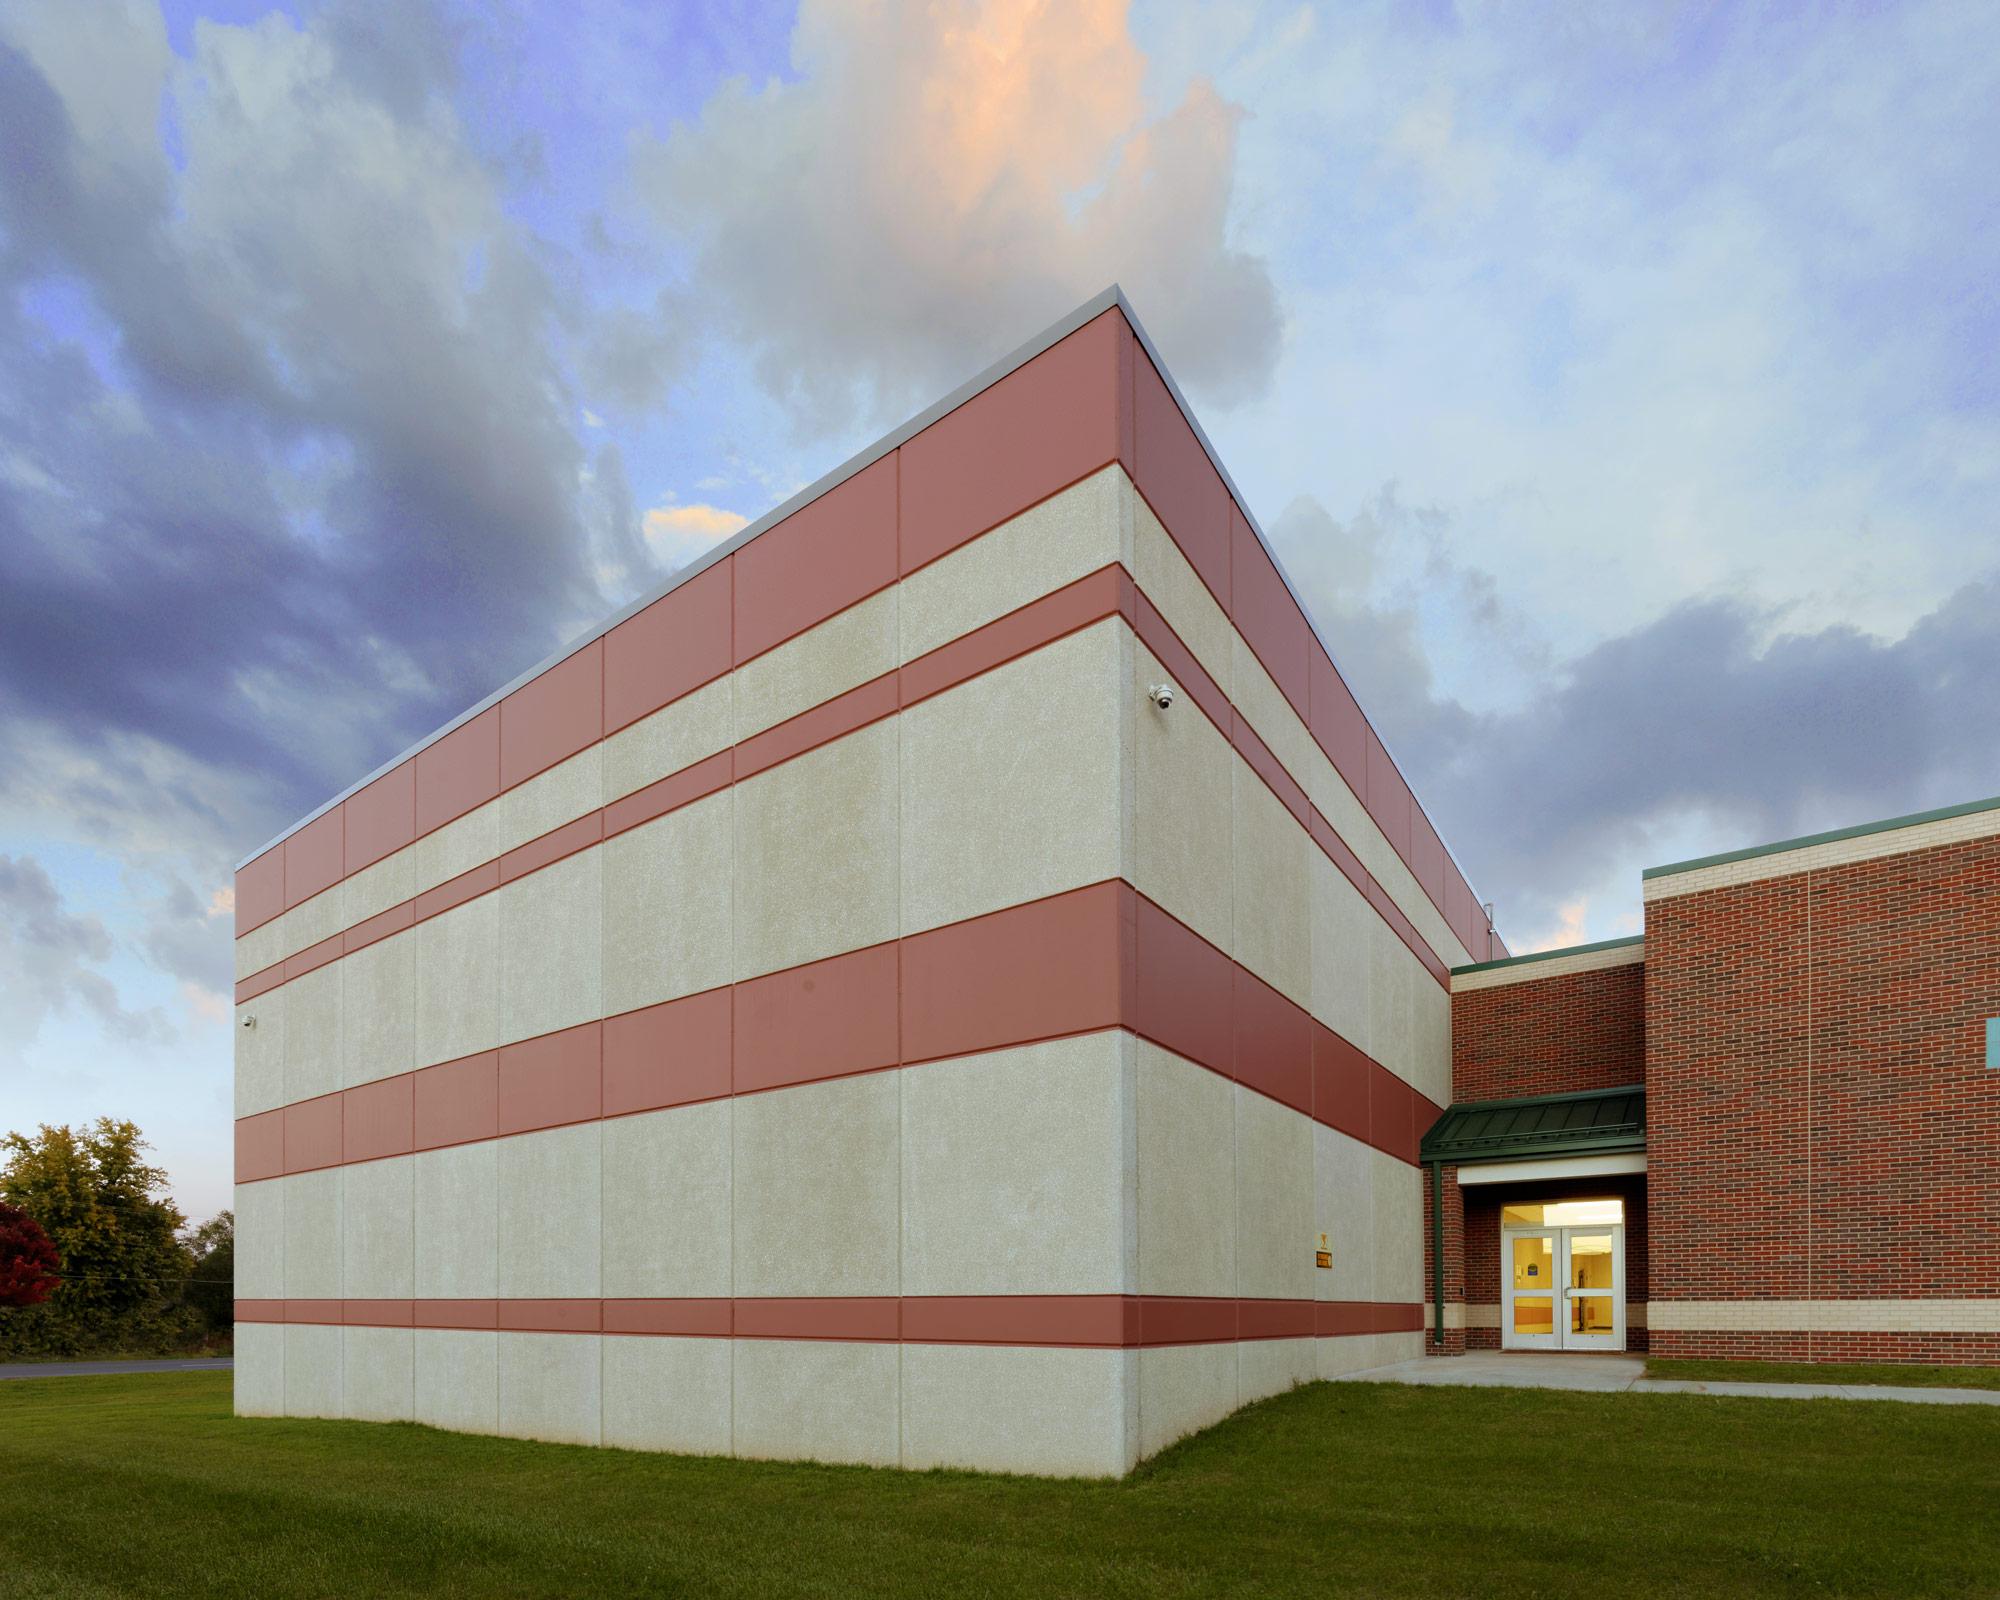 Republic-Sweeny-FEMA-H-Design-Exterior-01.jpg